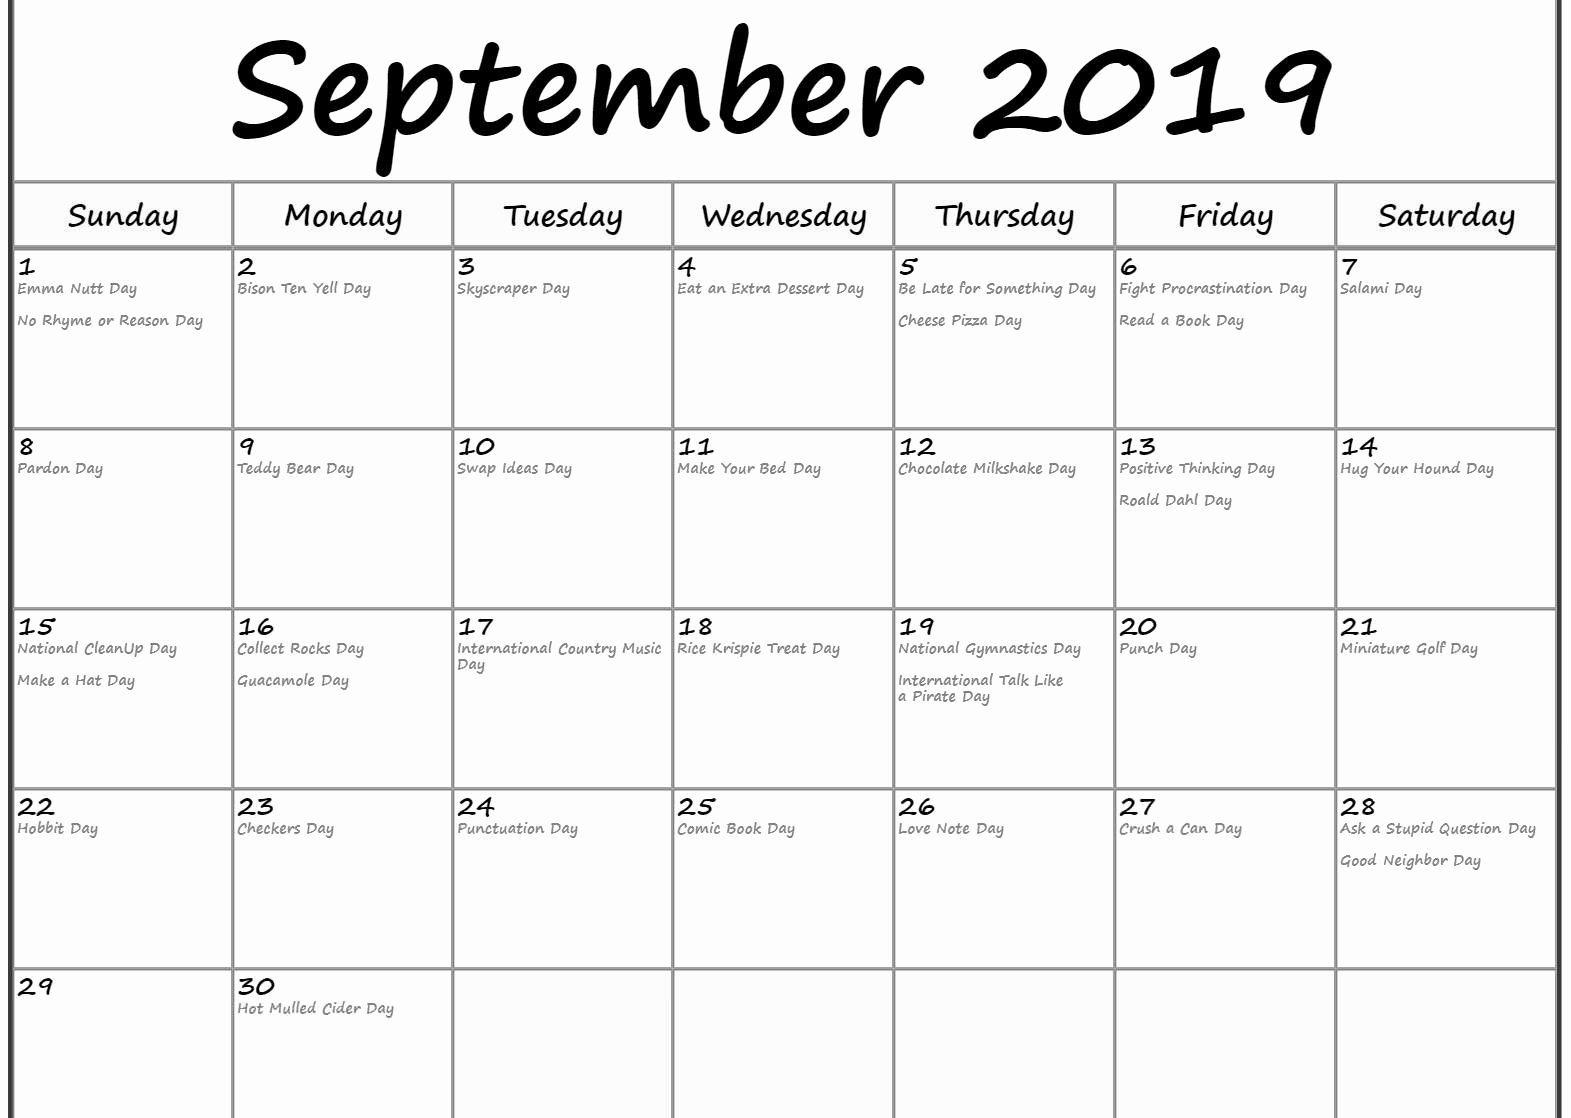 September 2019 Calendar Holidays US